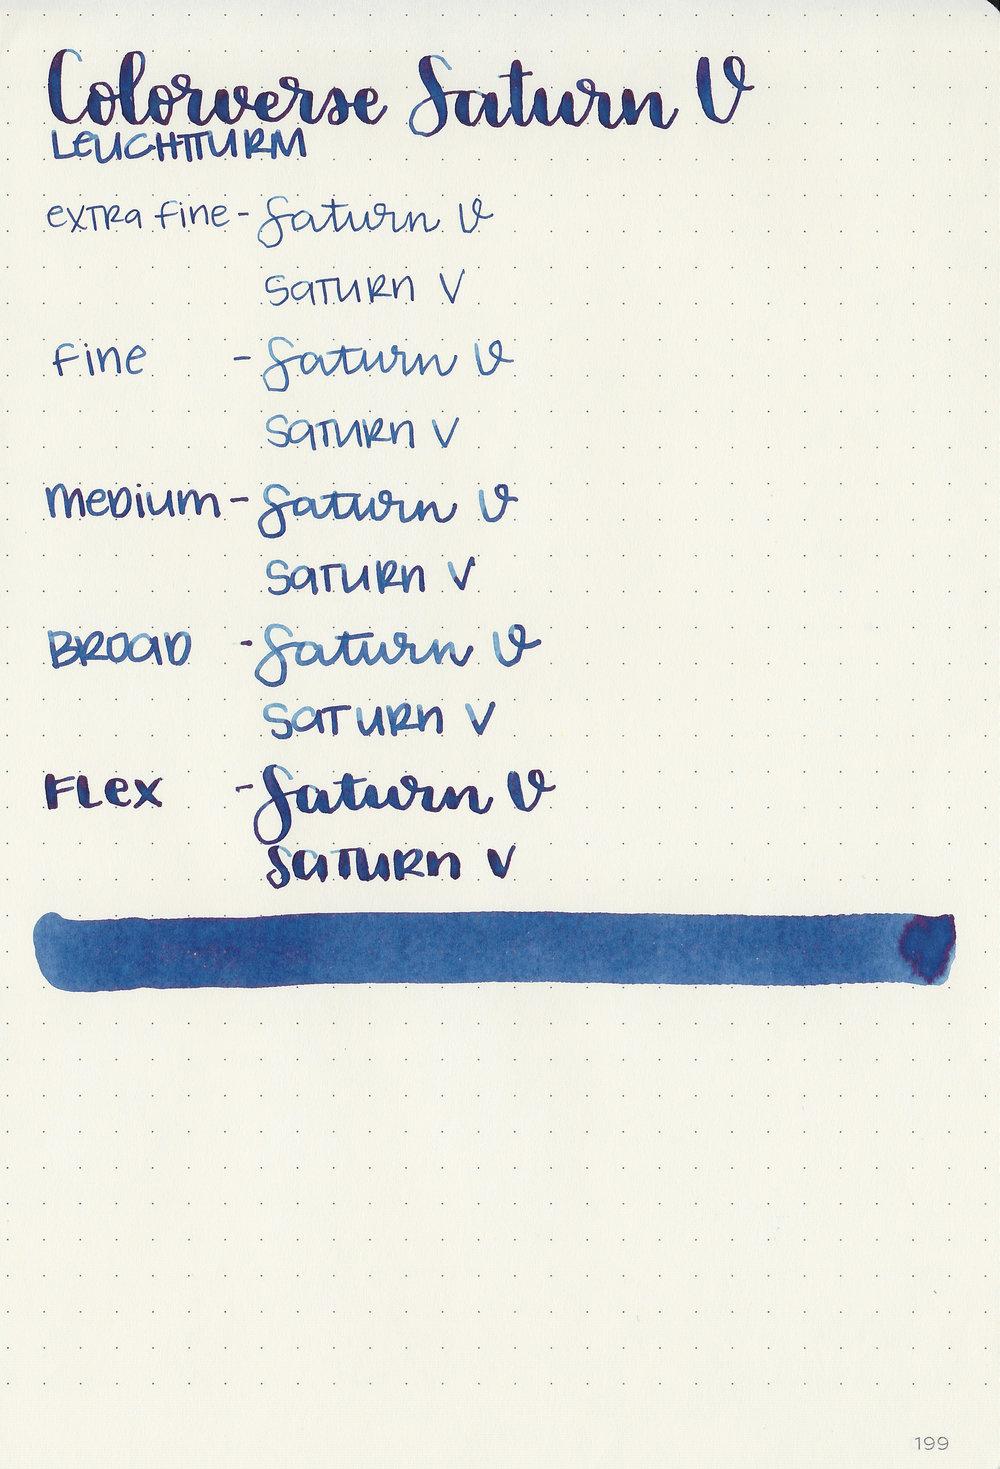 cv-saturn-v-10.jpg